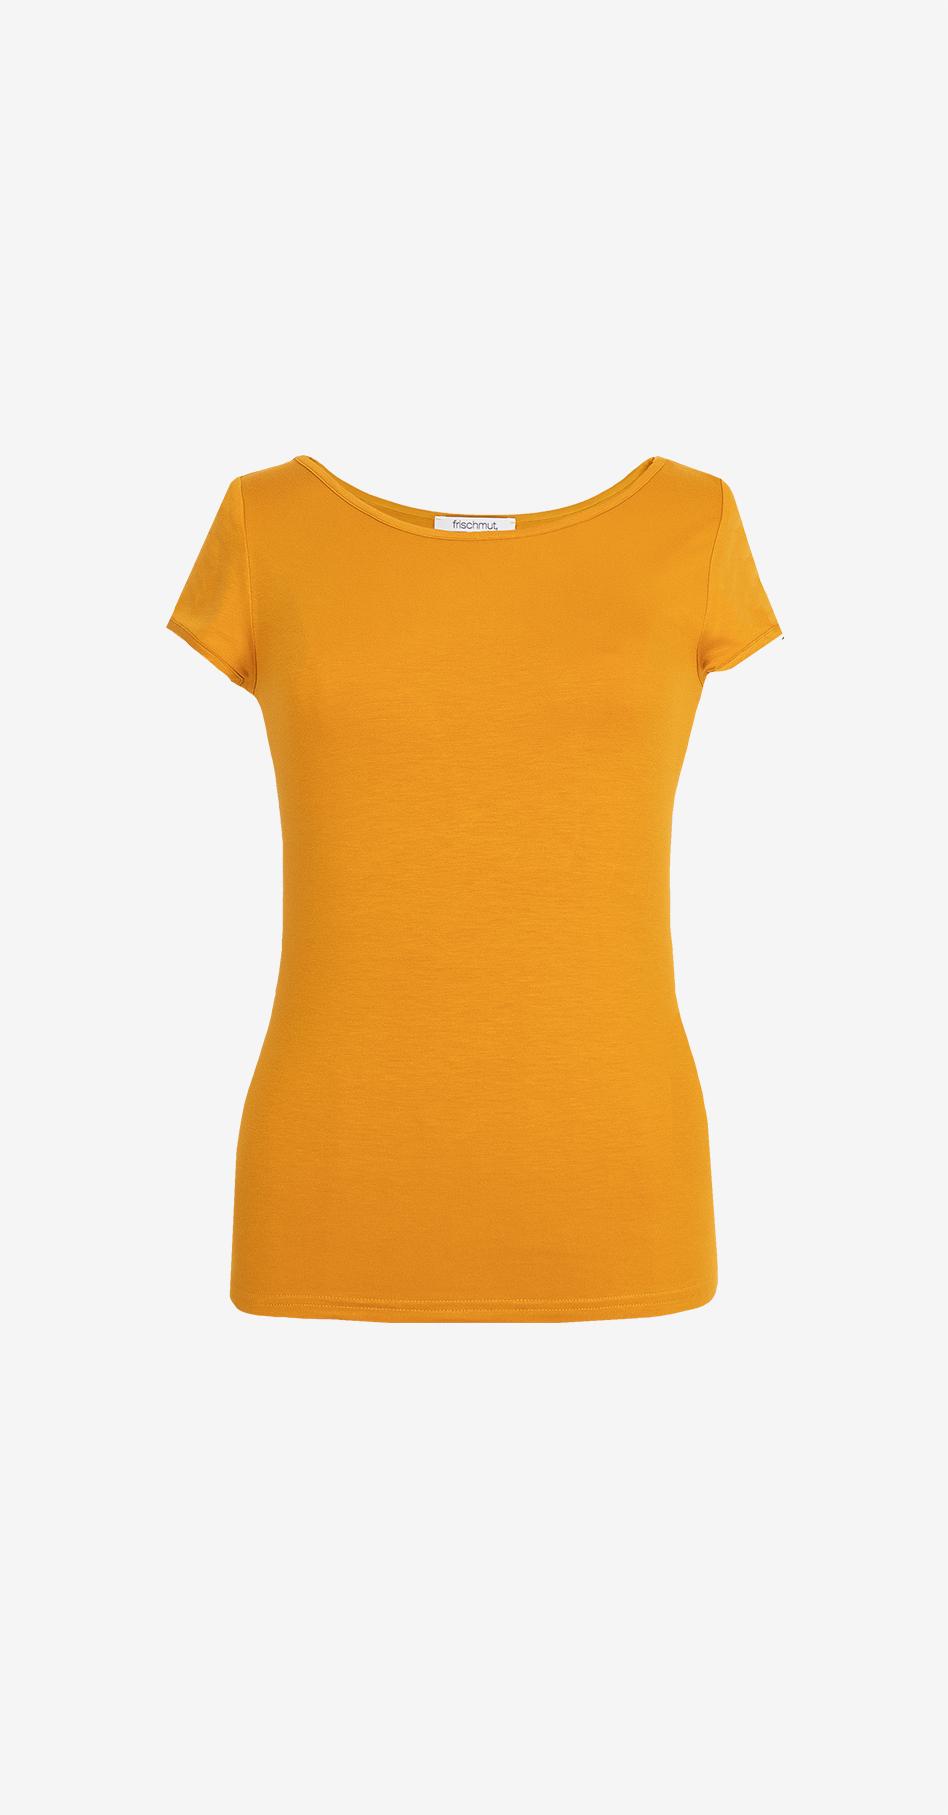 Shirt Mia/ kurzarm/ senfgelb